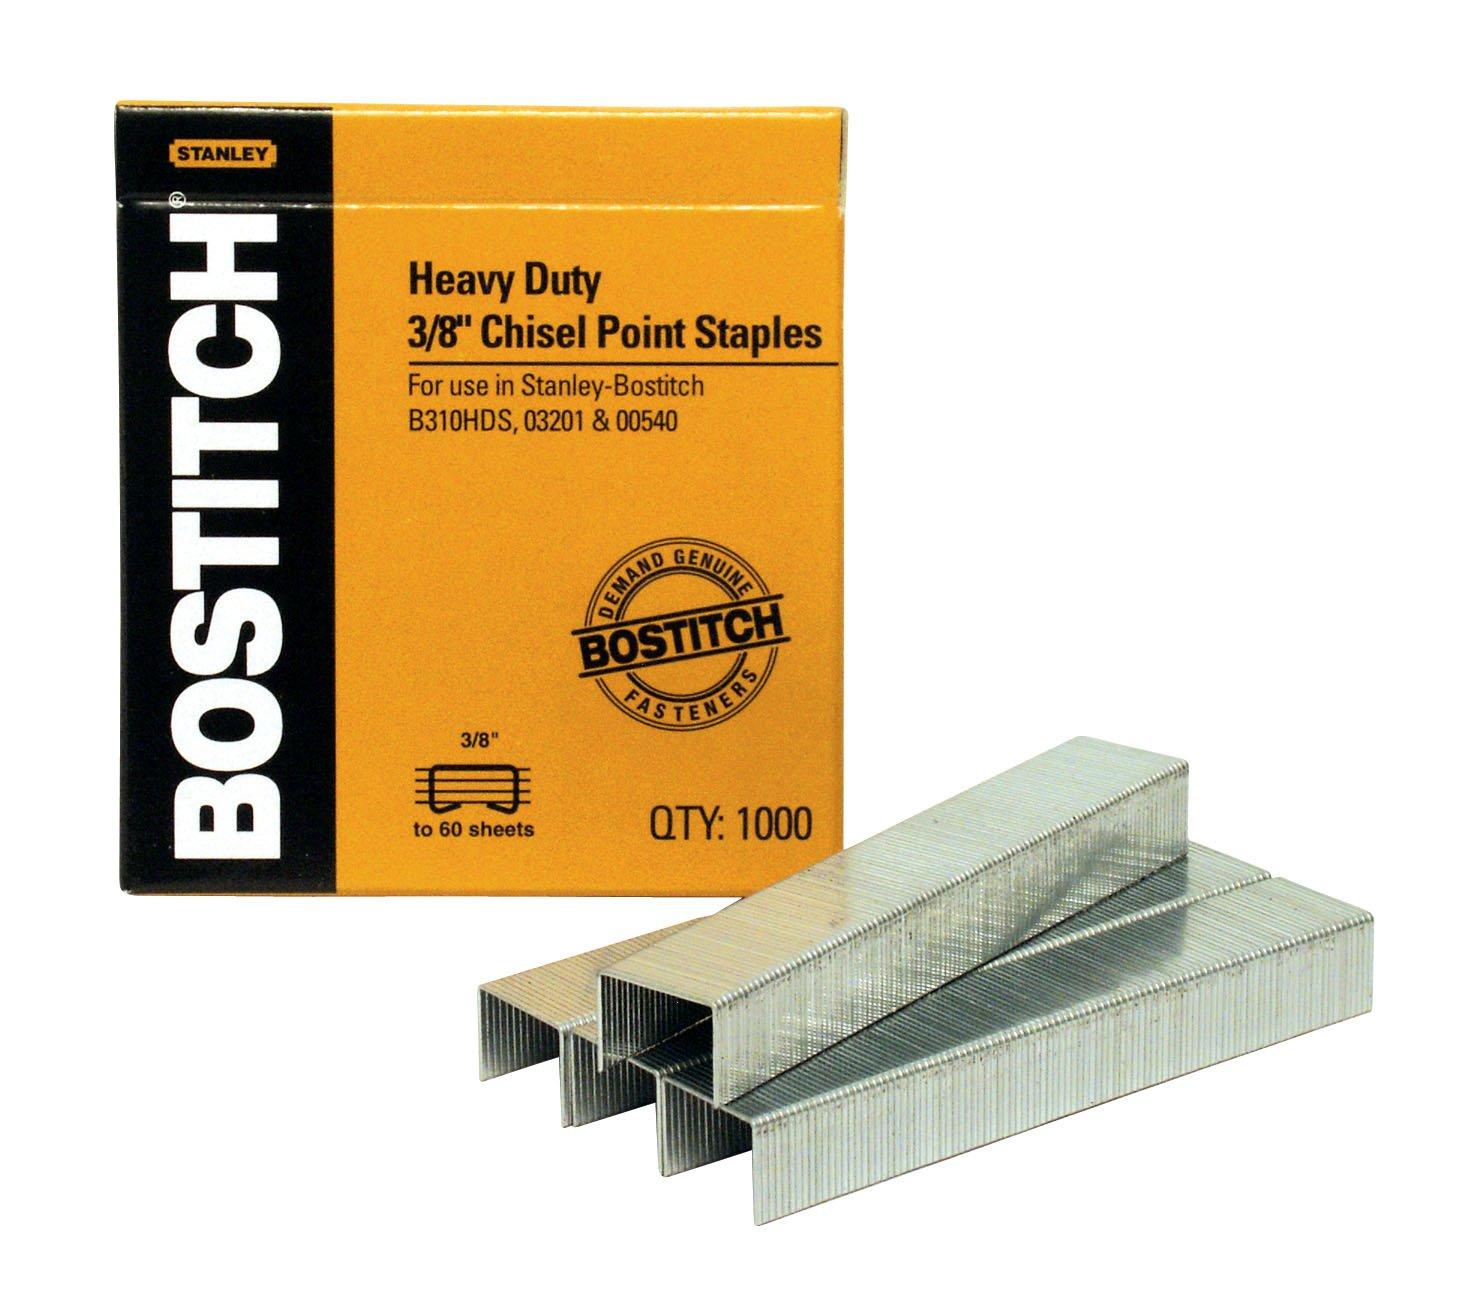 Amazon.com: Bostitch SB351/2-1M Heavy Duty Premium Staples,: Office Products